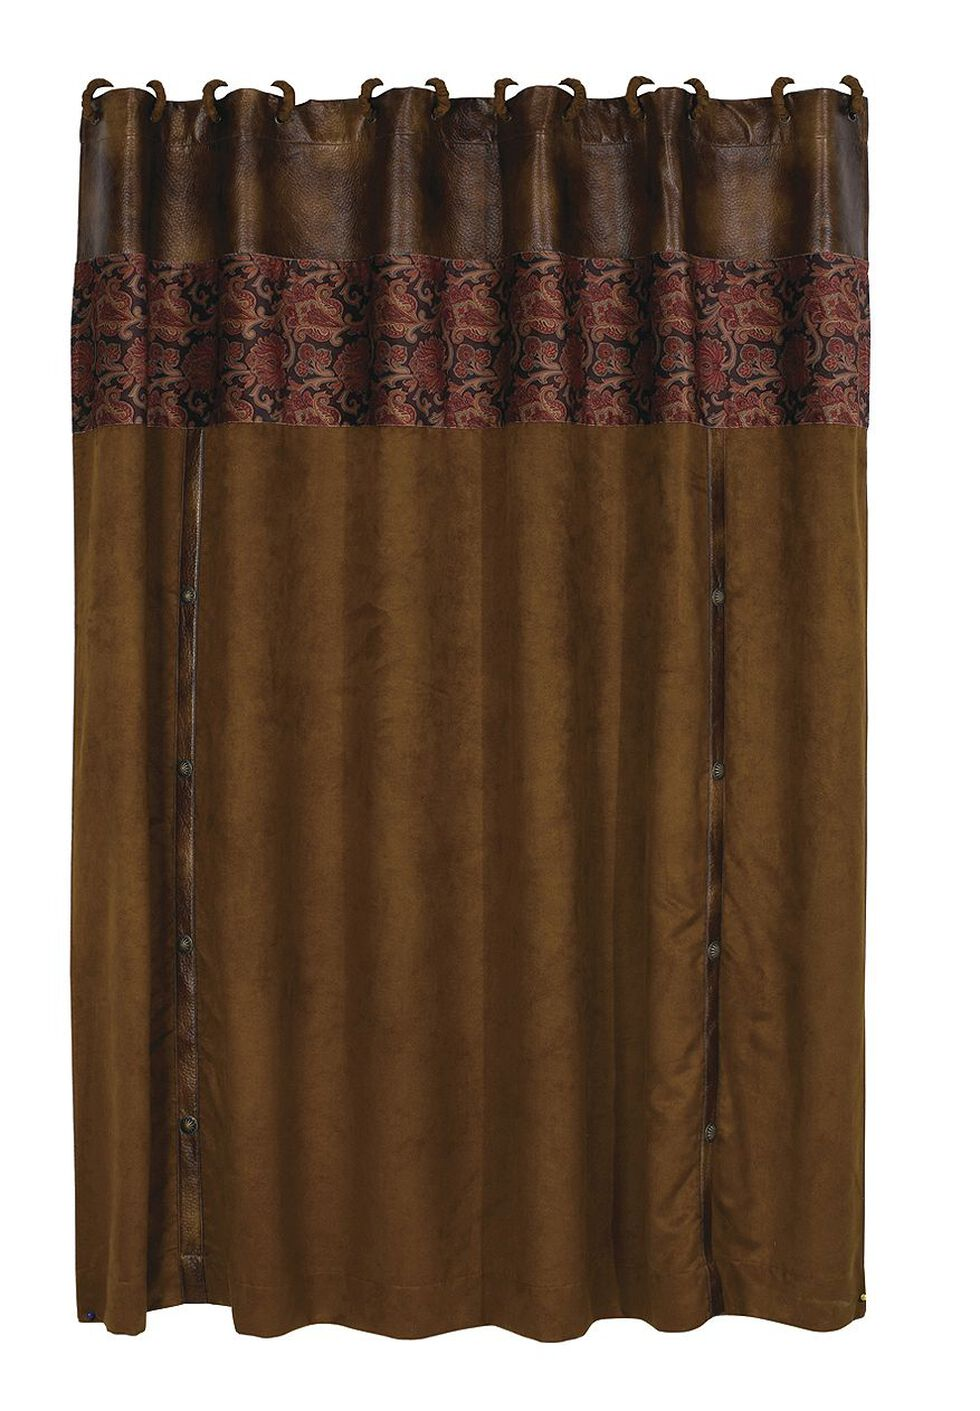 HiEnd Accents Austin Shower Curtain, Multi, hi-res